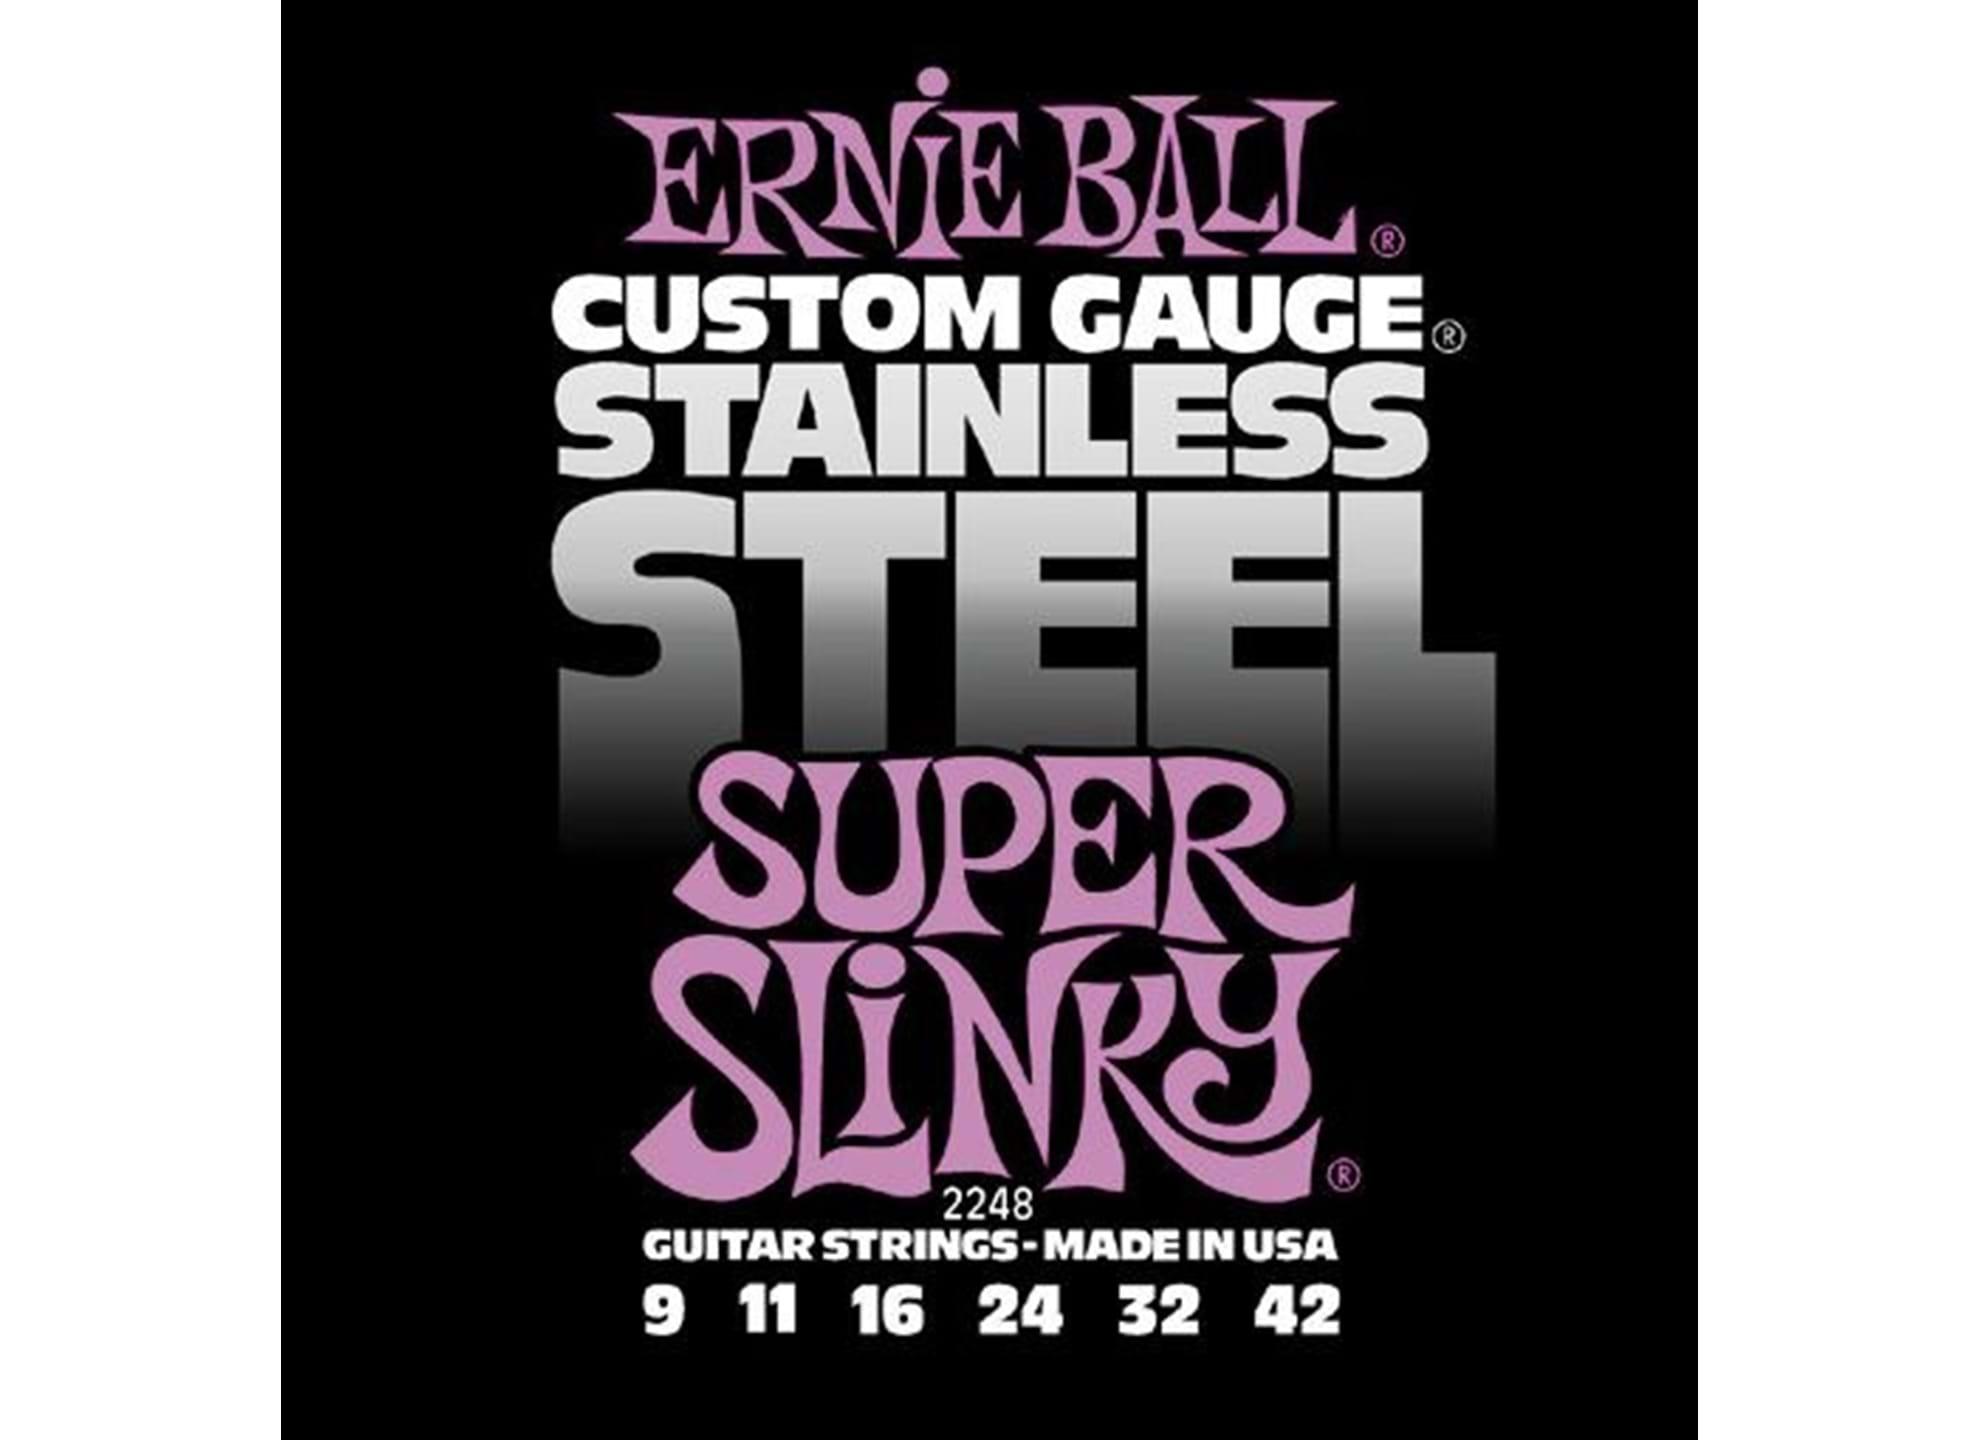 009-042 Super Slinky Stainless Steel 2248